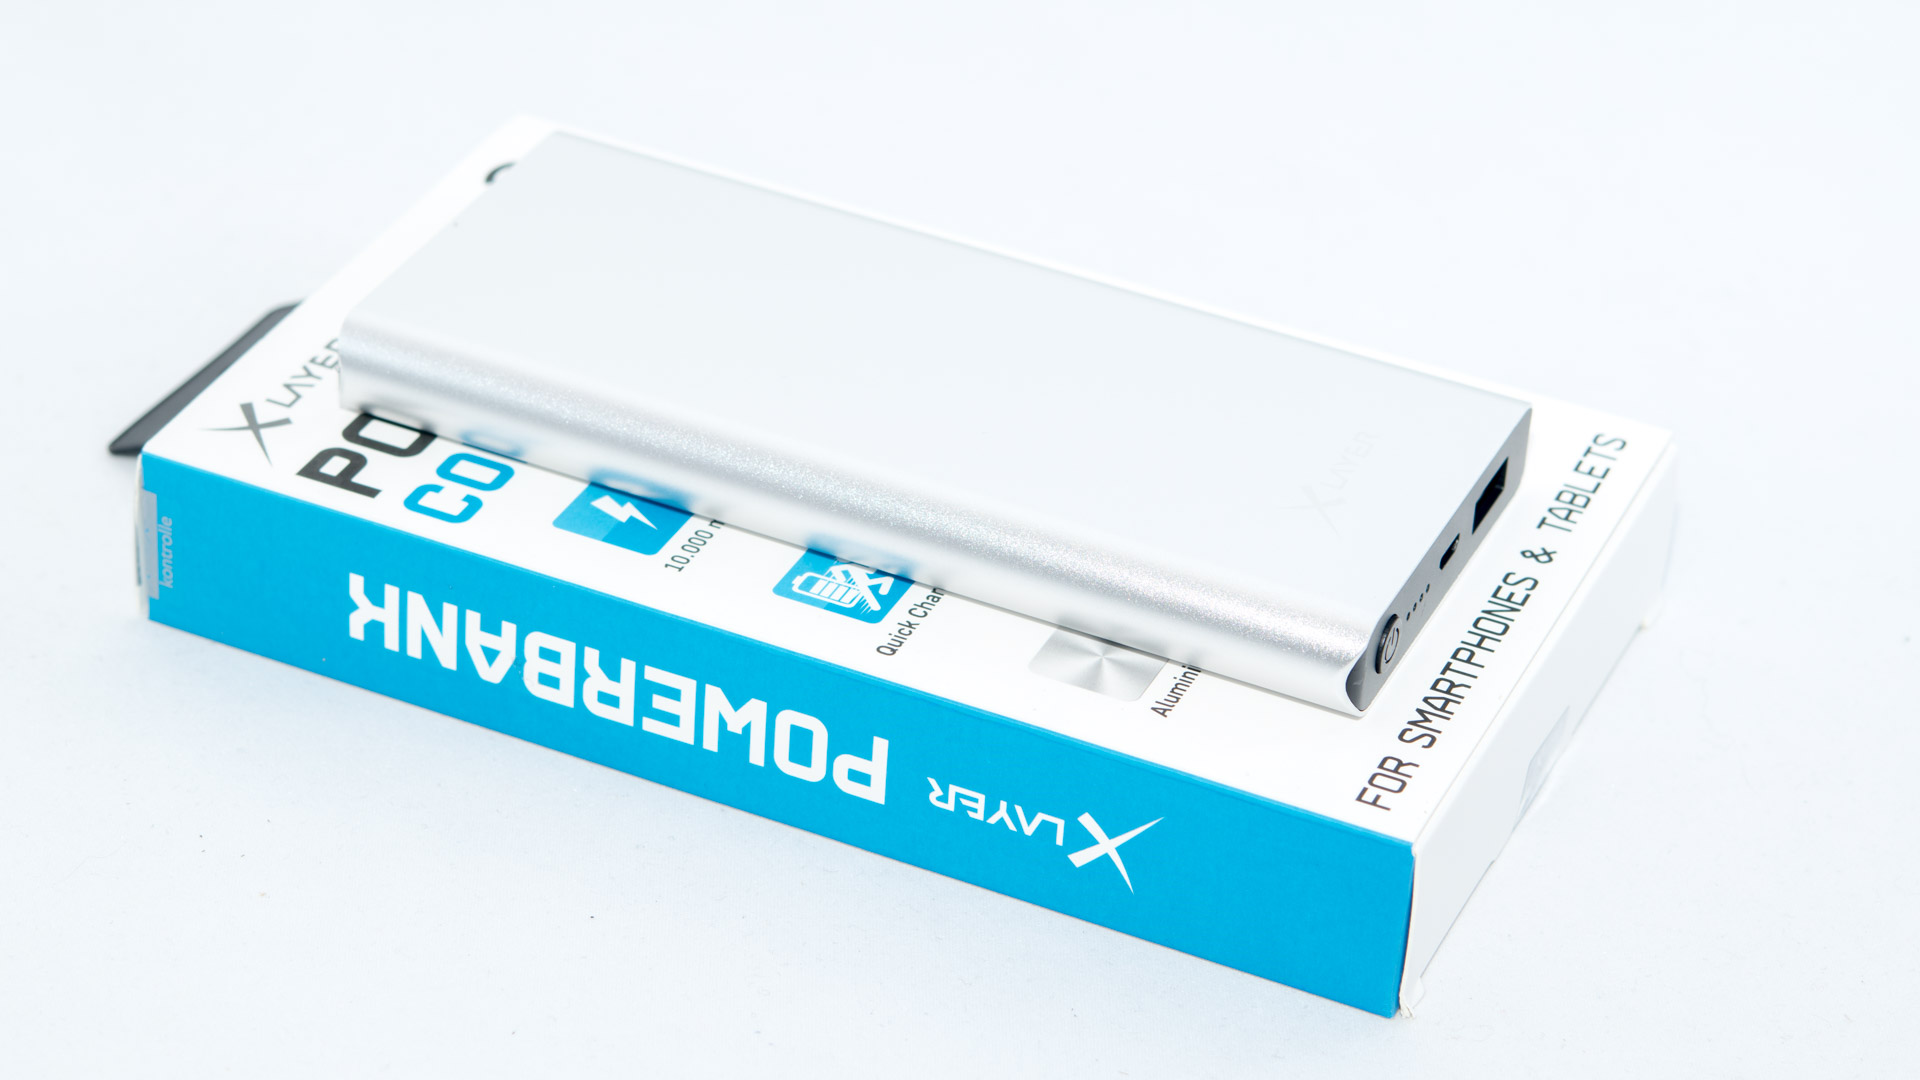 Die Xlayer Comfort Pro 10000 Mit Quick Charge Im Test Fast Samsung Galaxy S9 Free Anker Powerbank Mah Purple